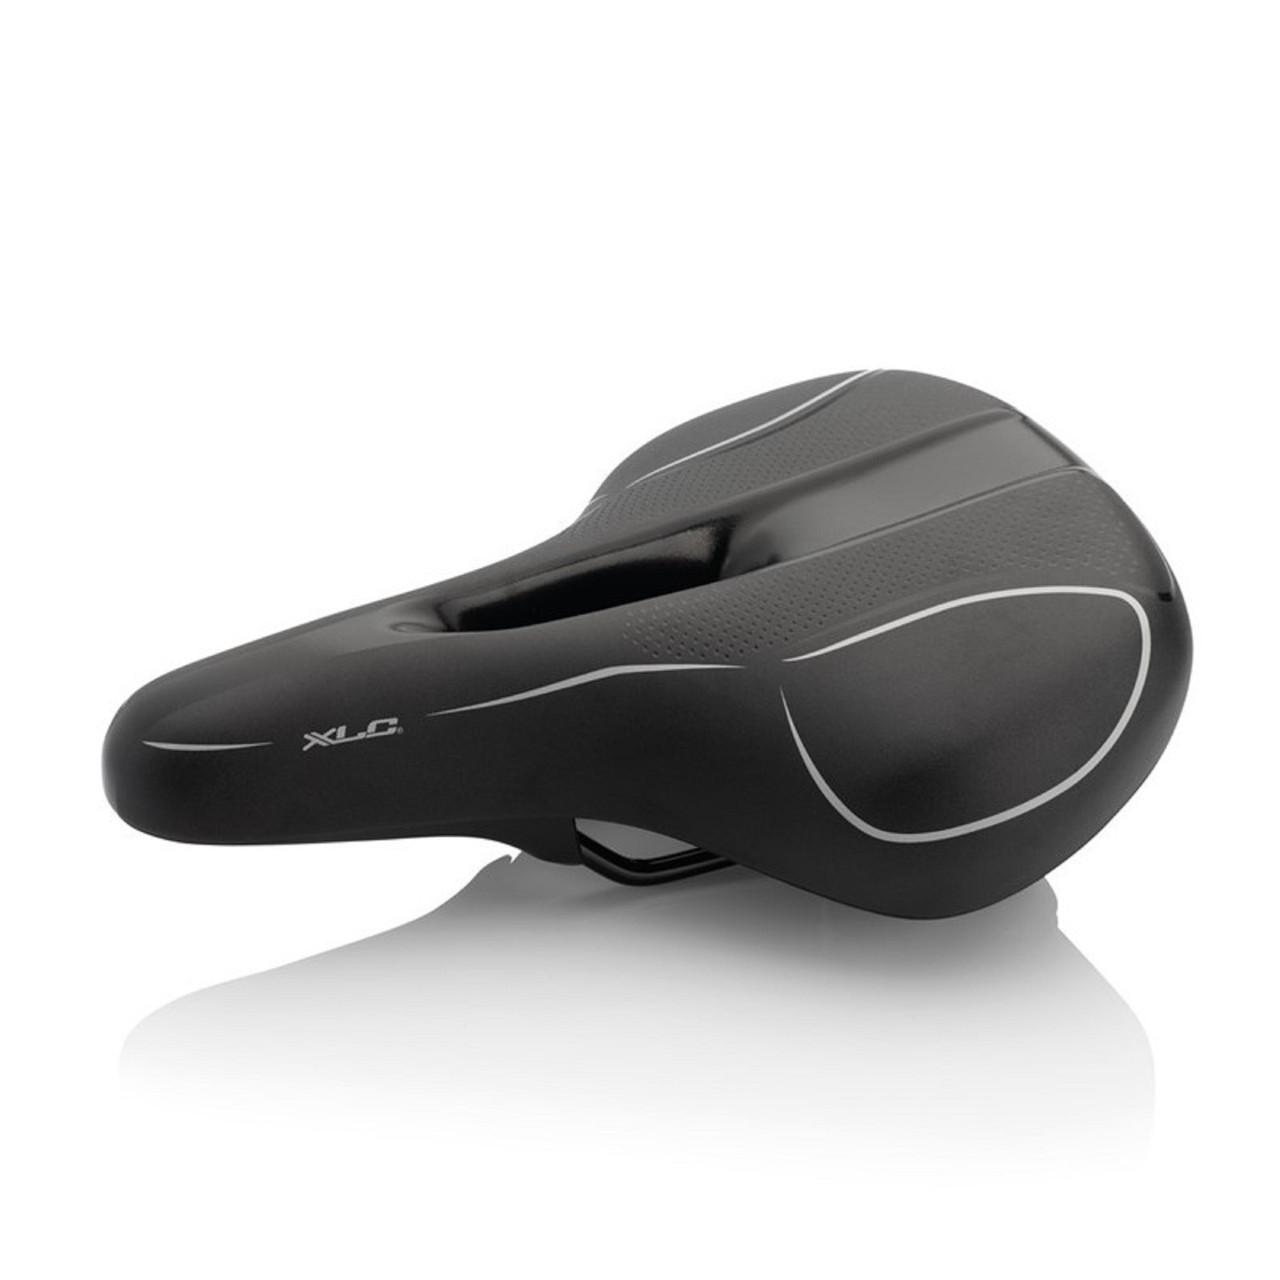 Седло XLC SA-T10 City/Urban, черное, мужское, 275x210mm,  710гр.